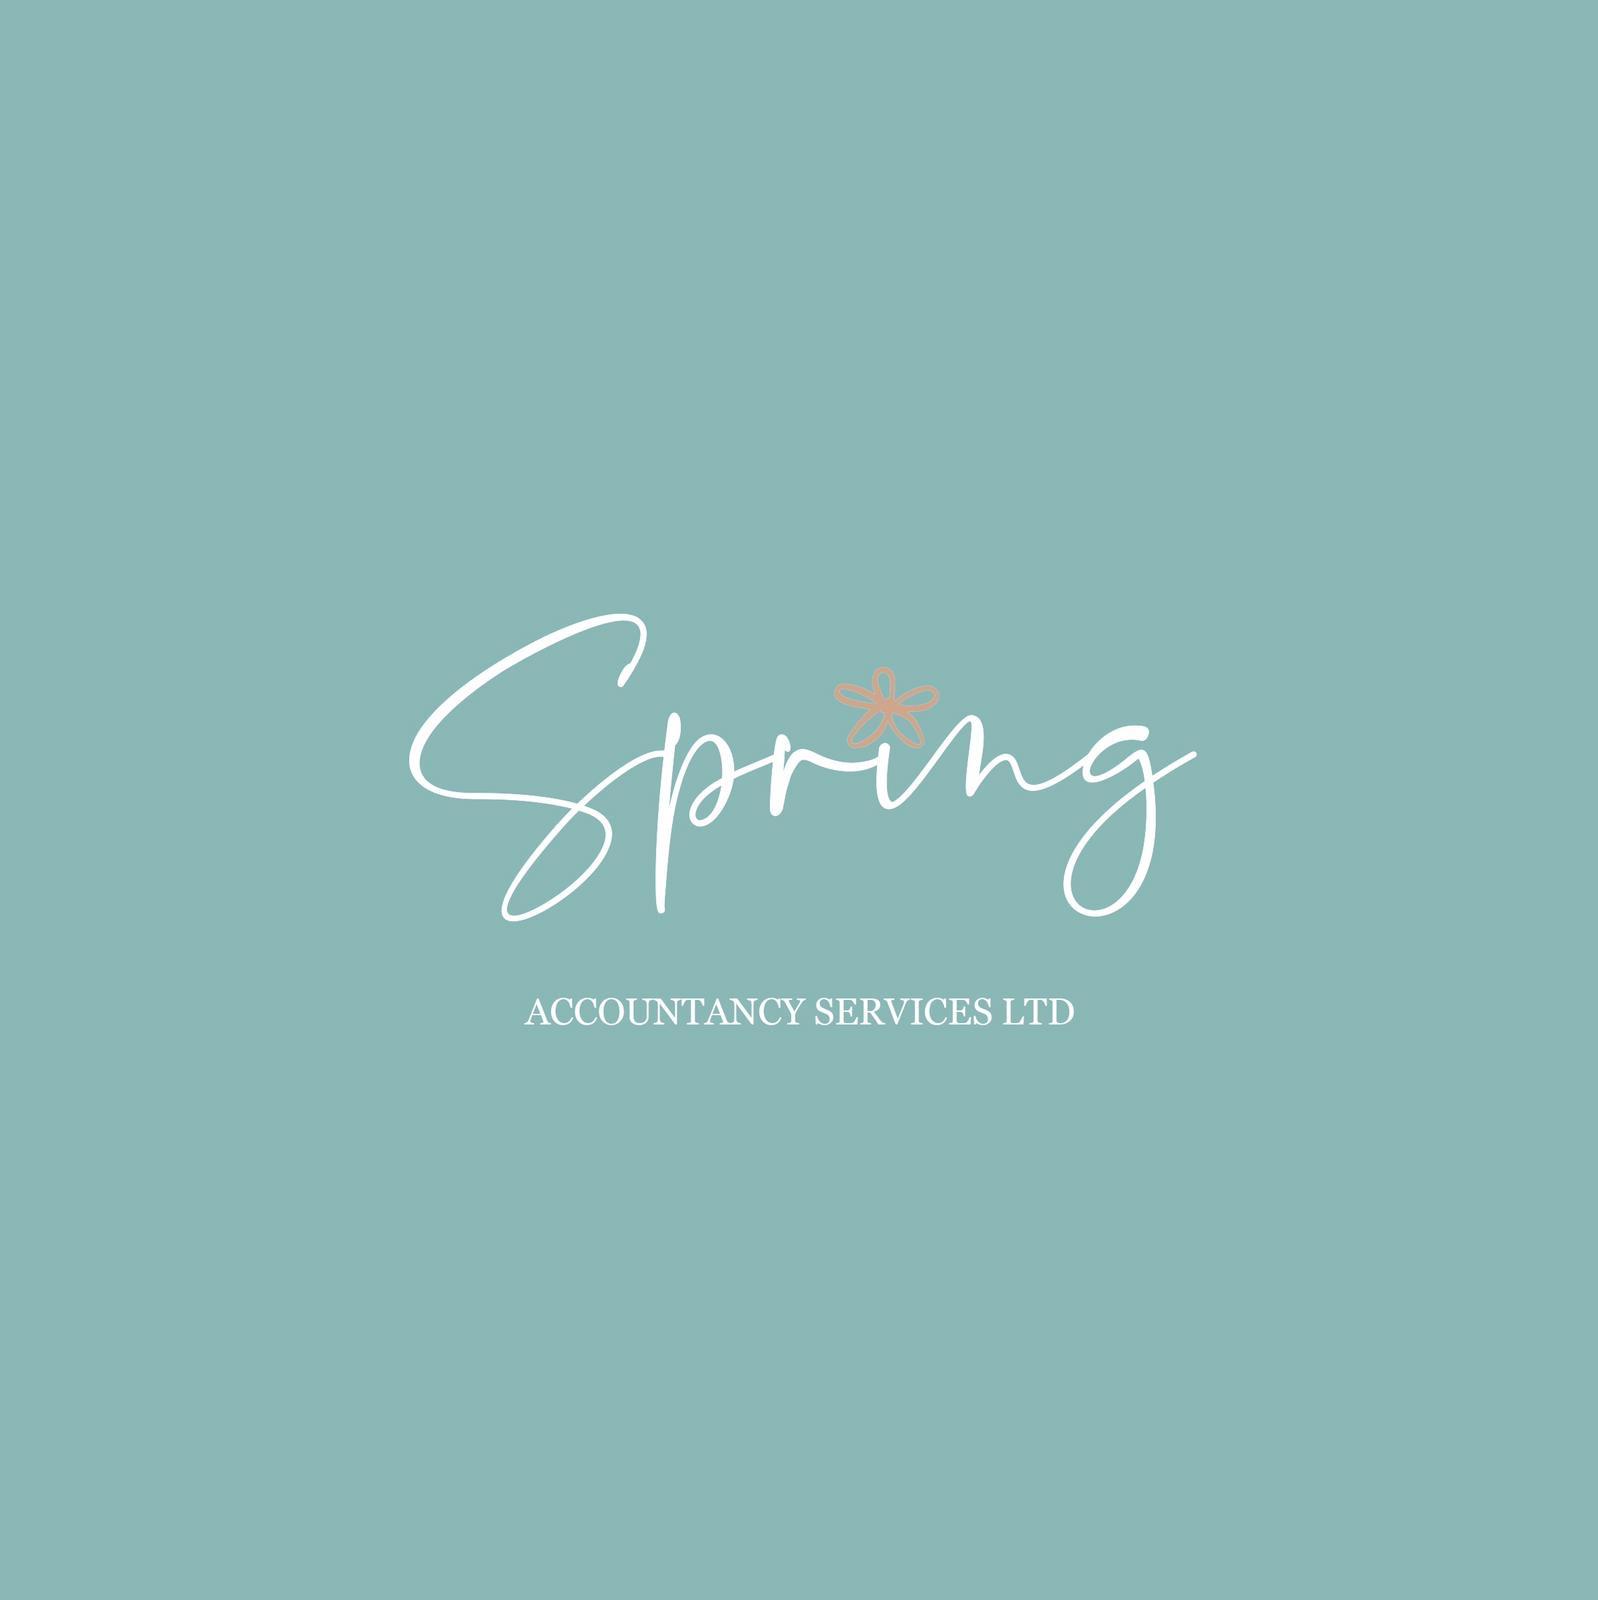 Spring Accountancy Services Ltd